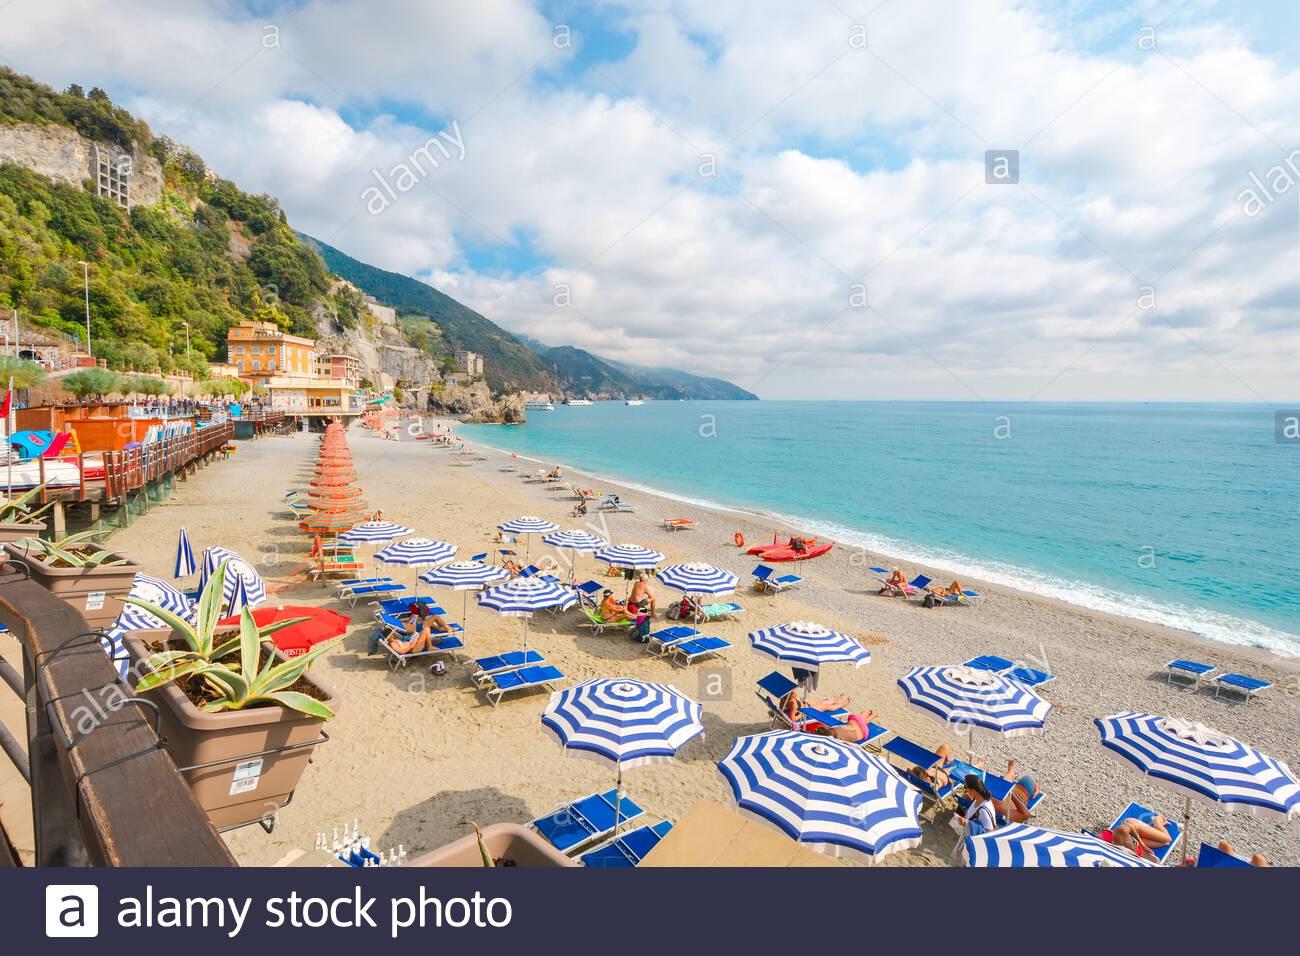 The sea and sandy beach Spiaggia di Fegina at the Cinque Terre Italy resort village of Monterosso al Mare with tourists enjoying the Italian Riviera Stock Photo